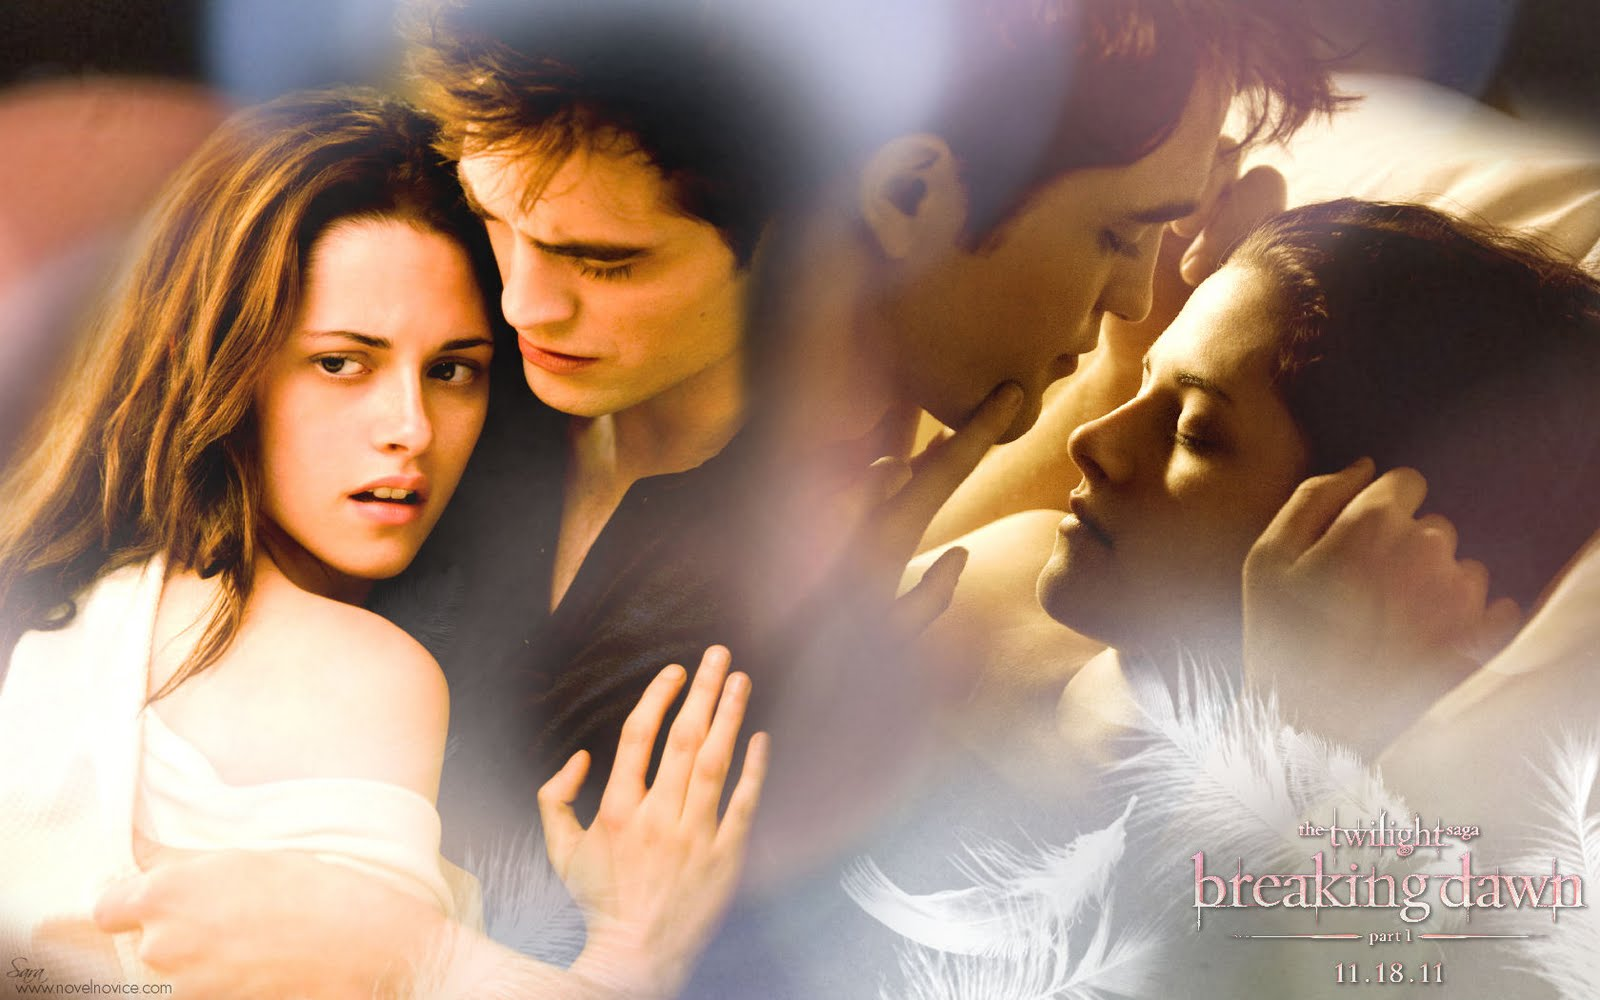 Twilight breaking dawn movie trailer wallpapers and reviews - Twilight breaking dawn wallpaper ...